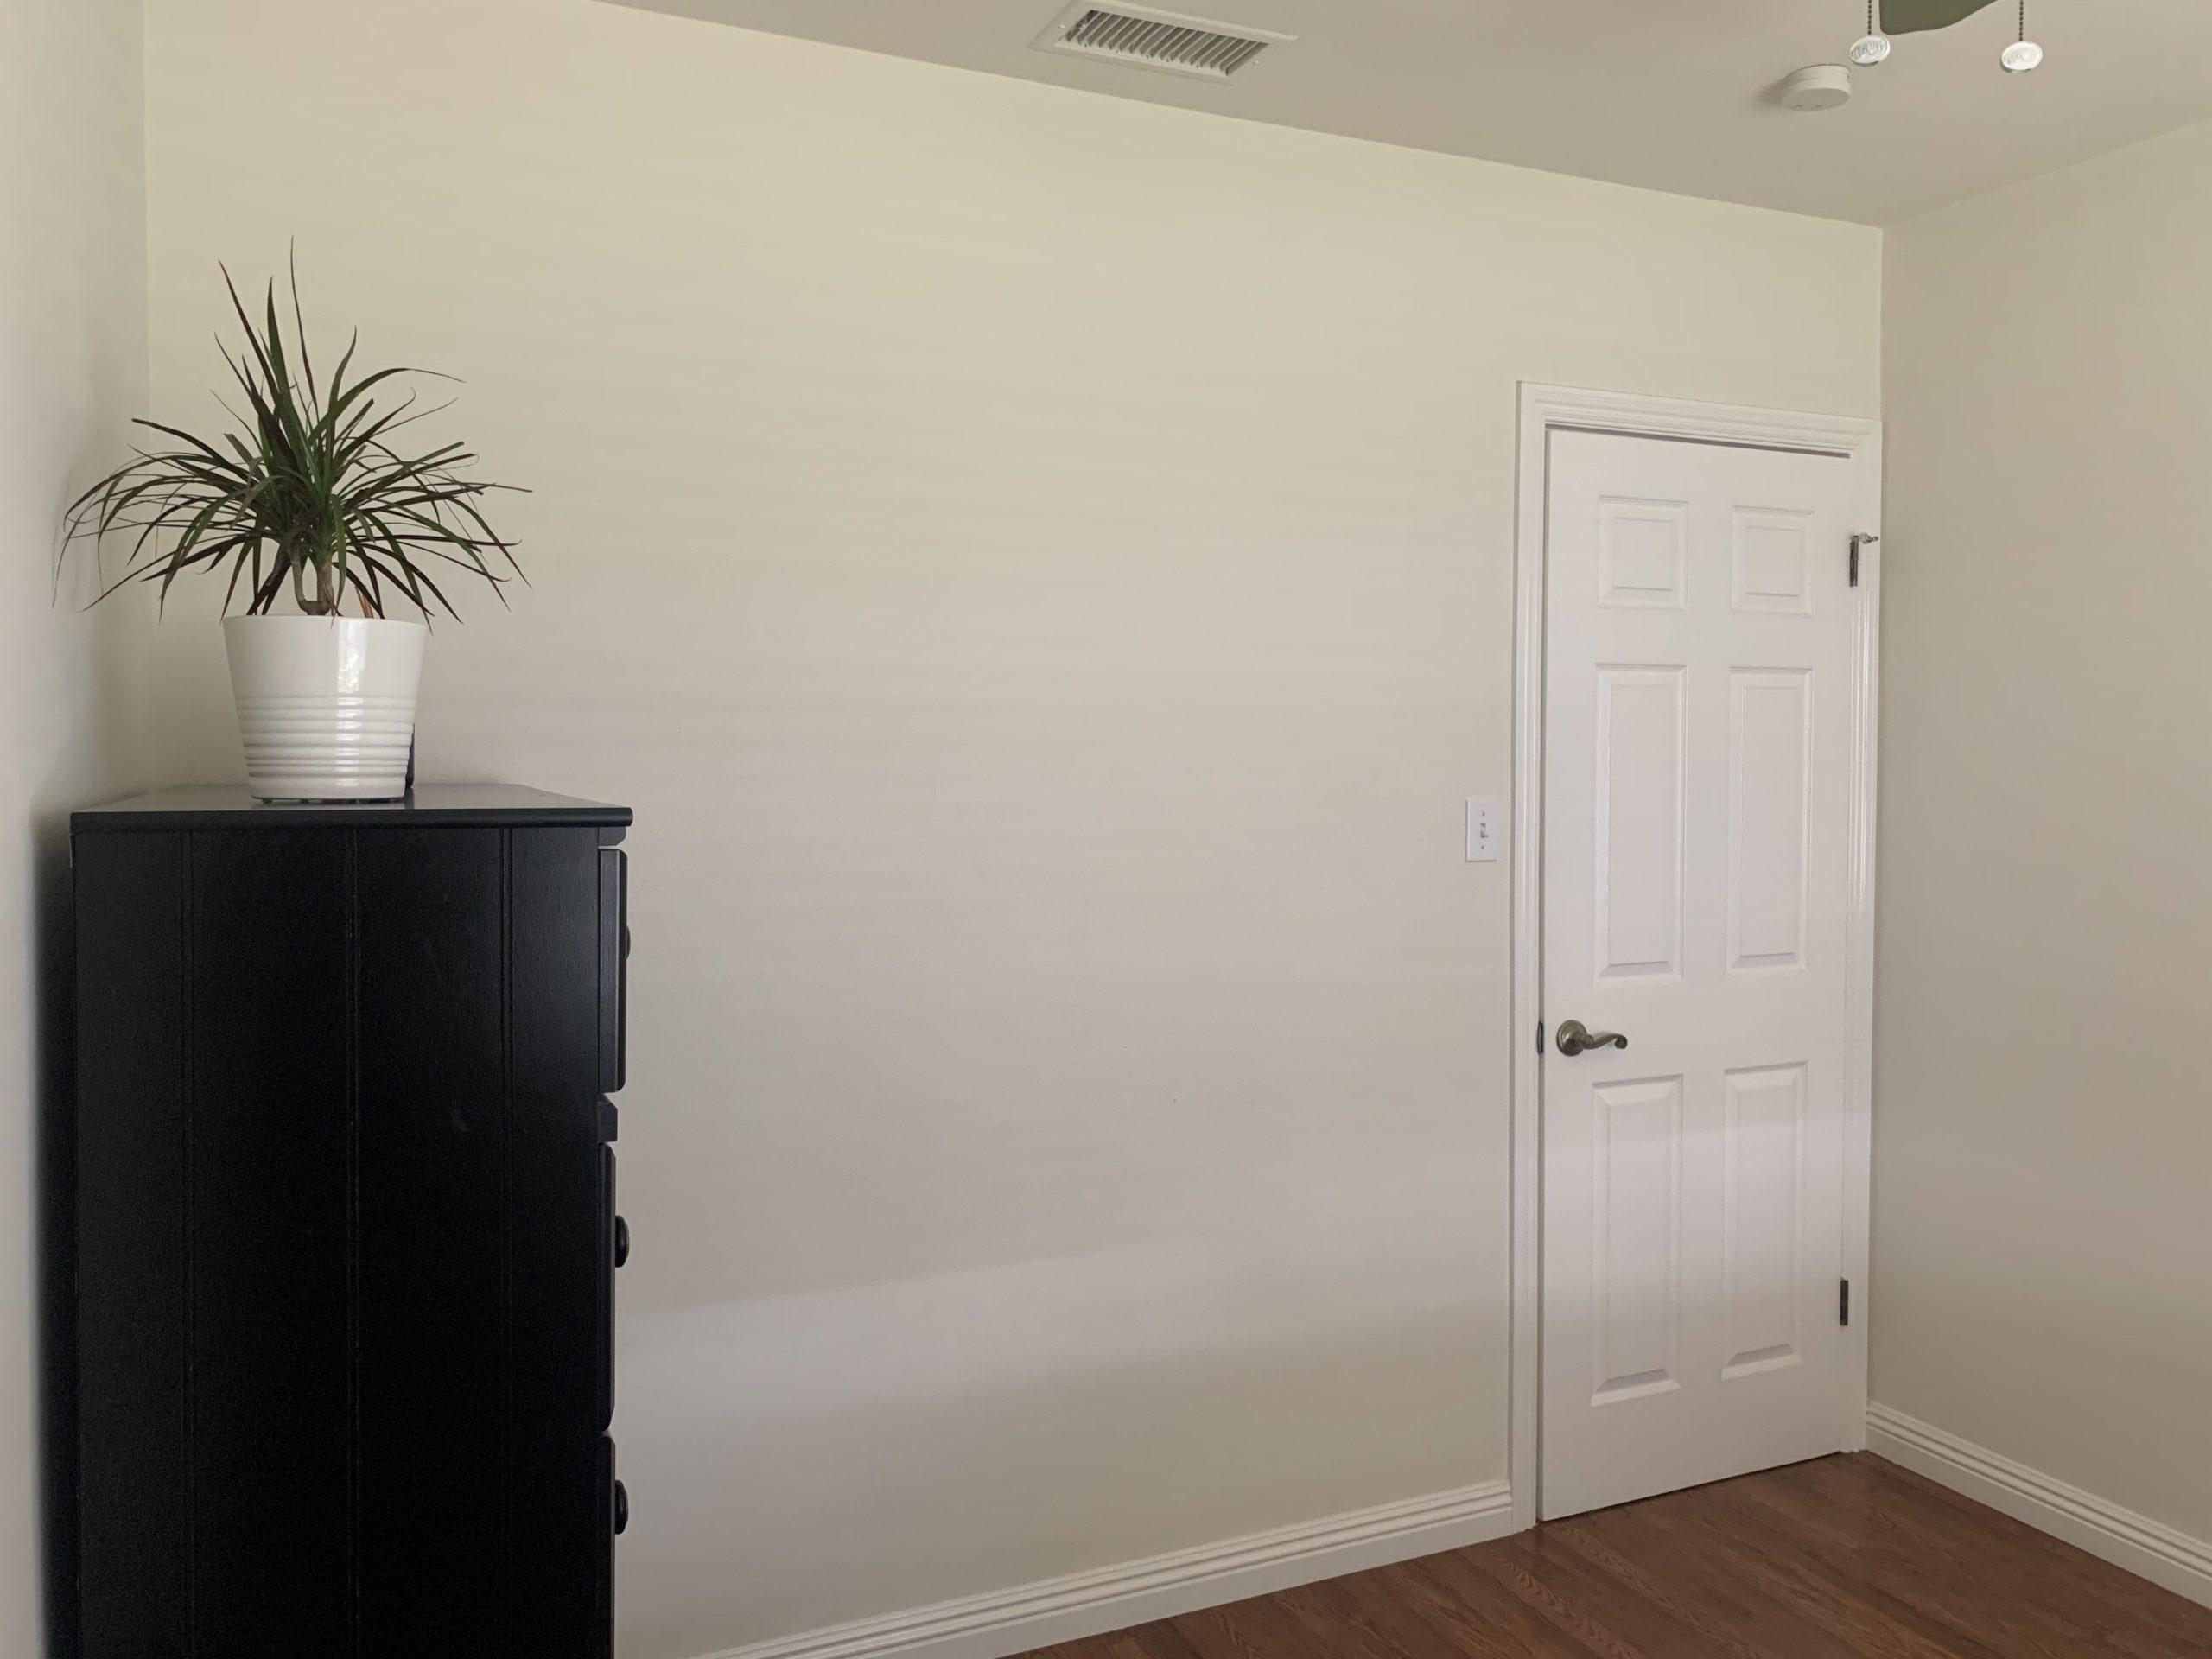 Dresser in a multi-purpose room